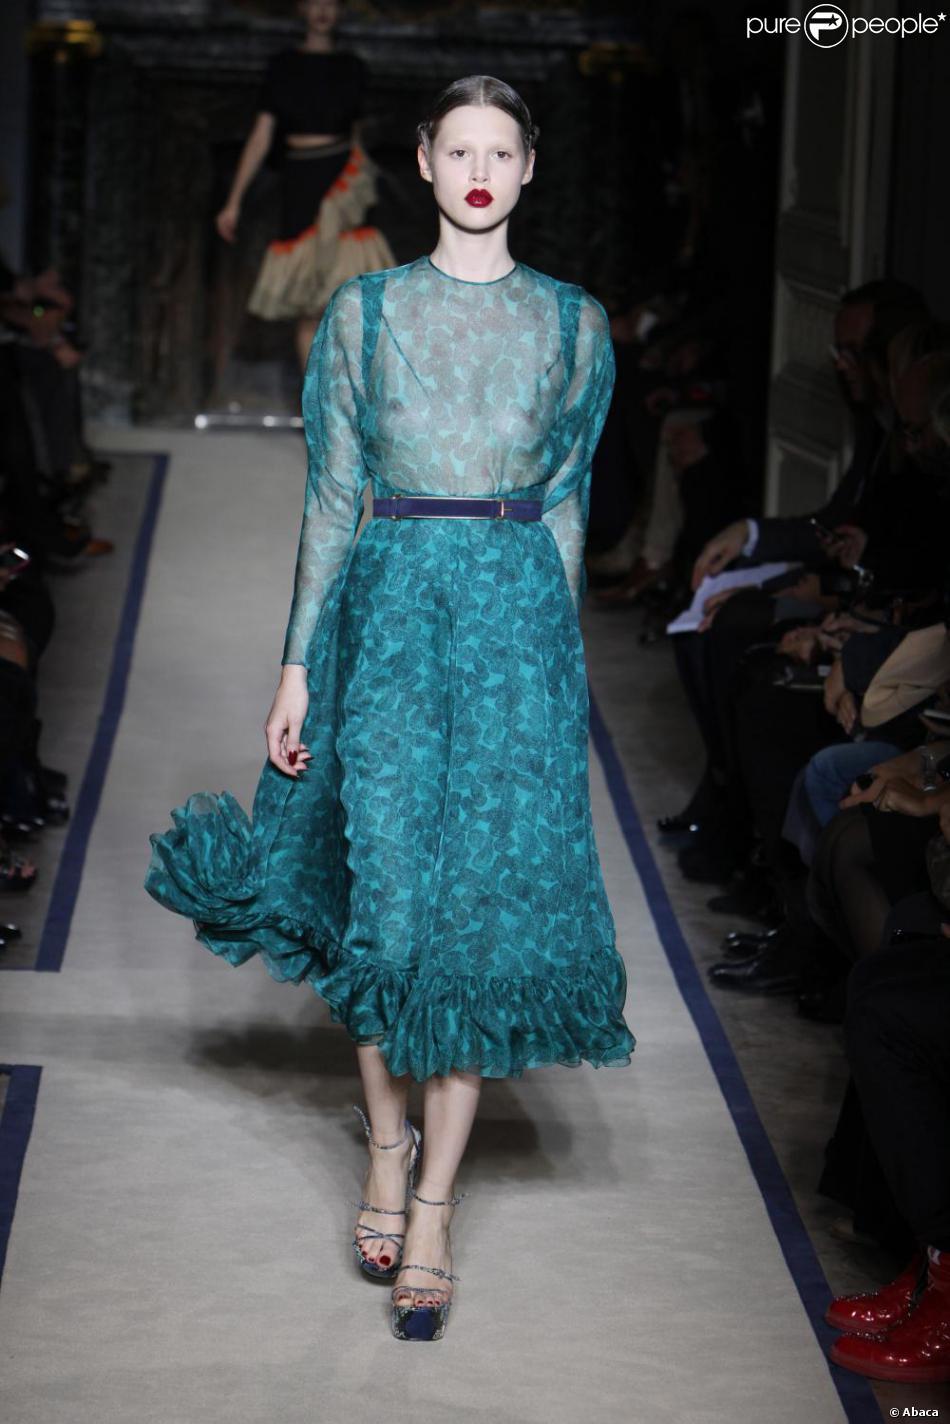 l 39 actrice devrait oser la robe transparente yves saint laurent bleu canard. Black Bedroom Furniture Sets. Home Design Ideas